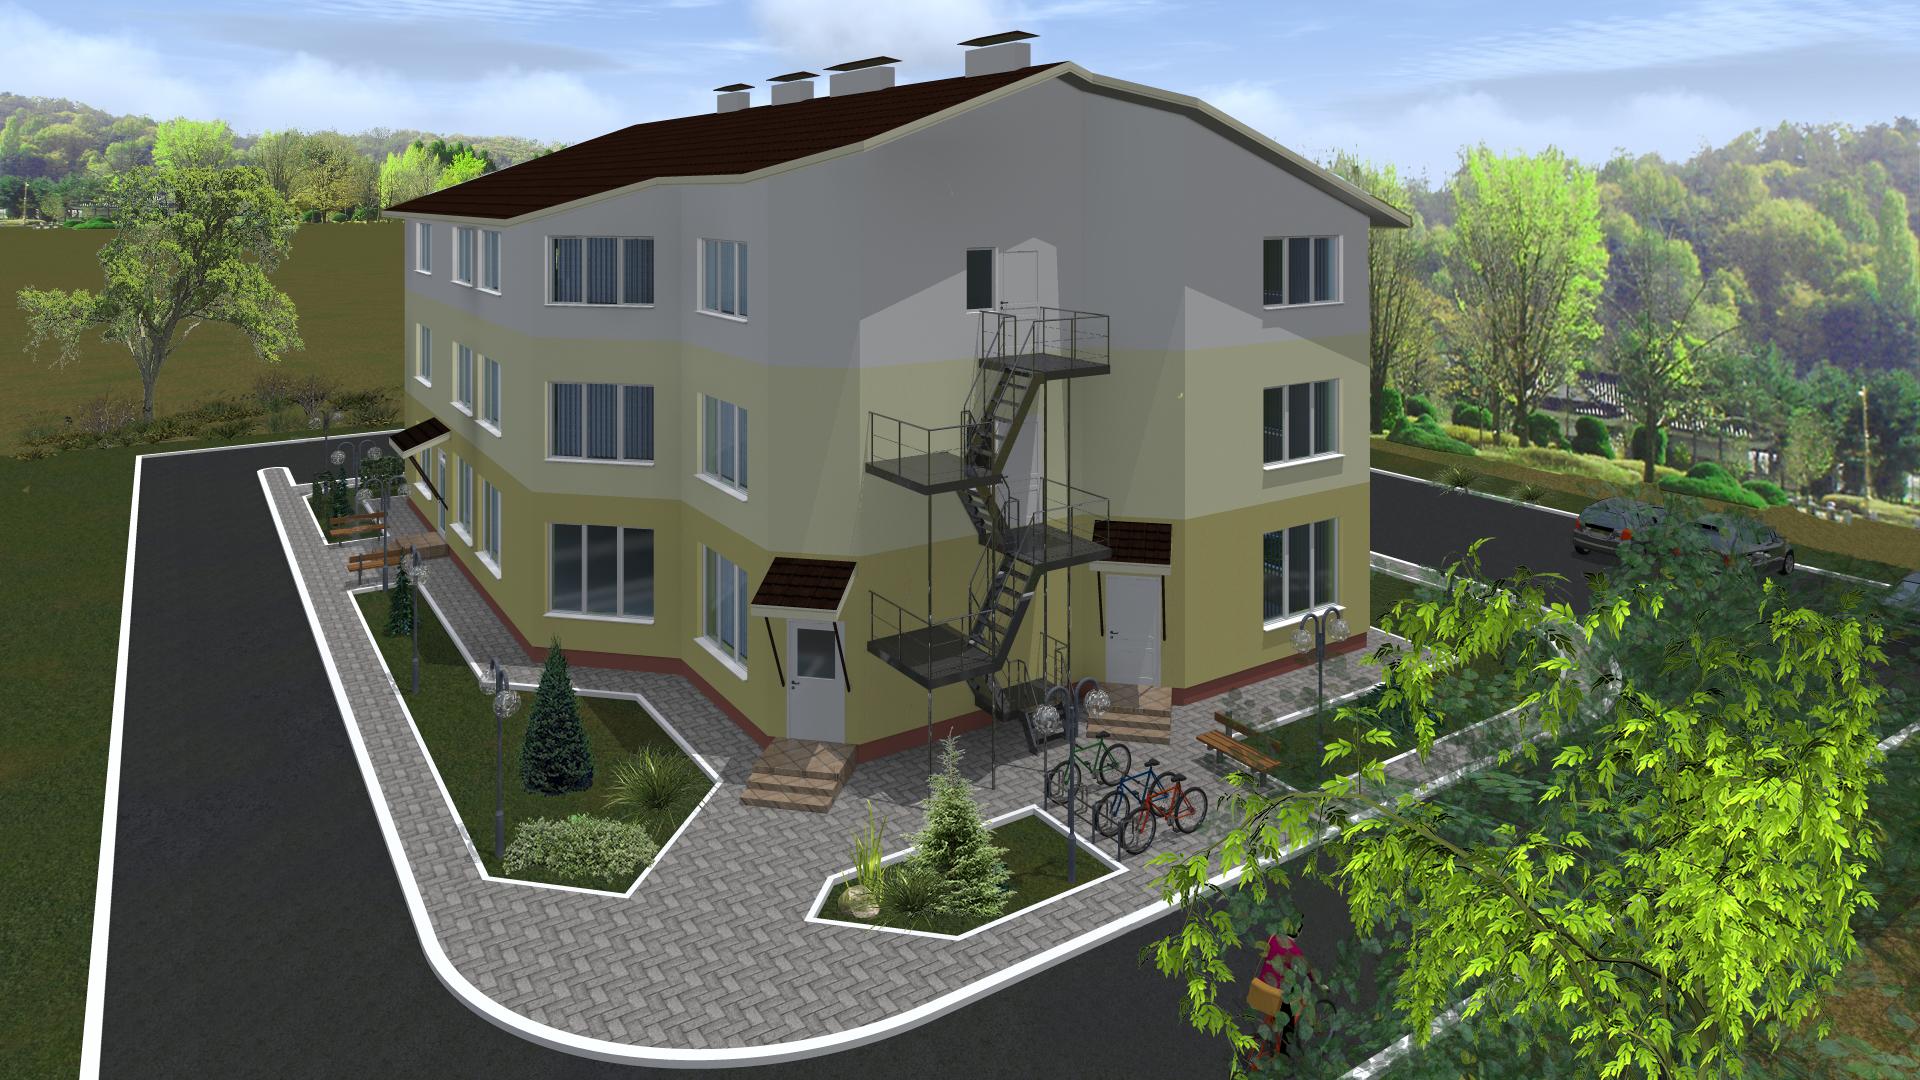 Административное здание. Деревня Ямно (Брестский район)